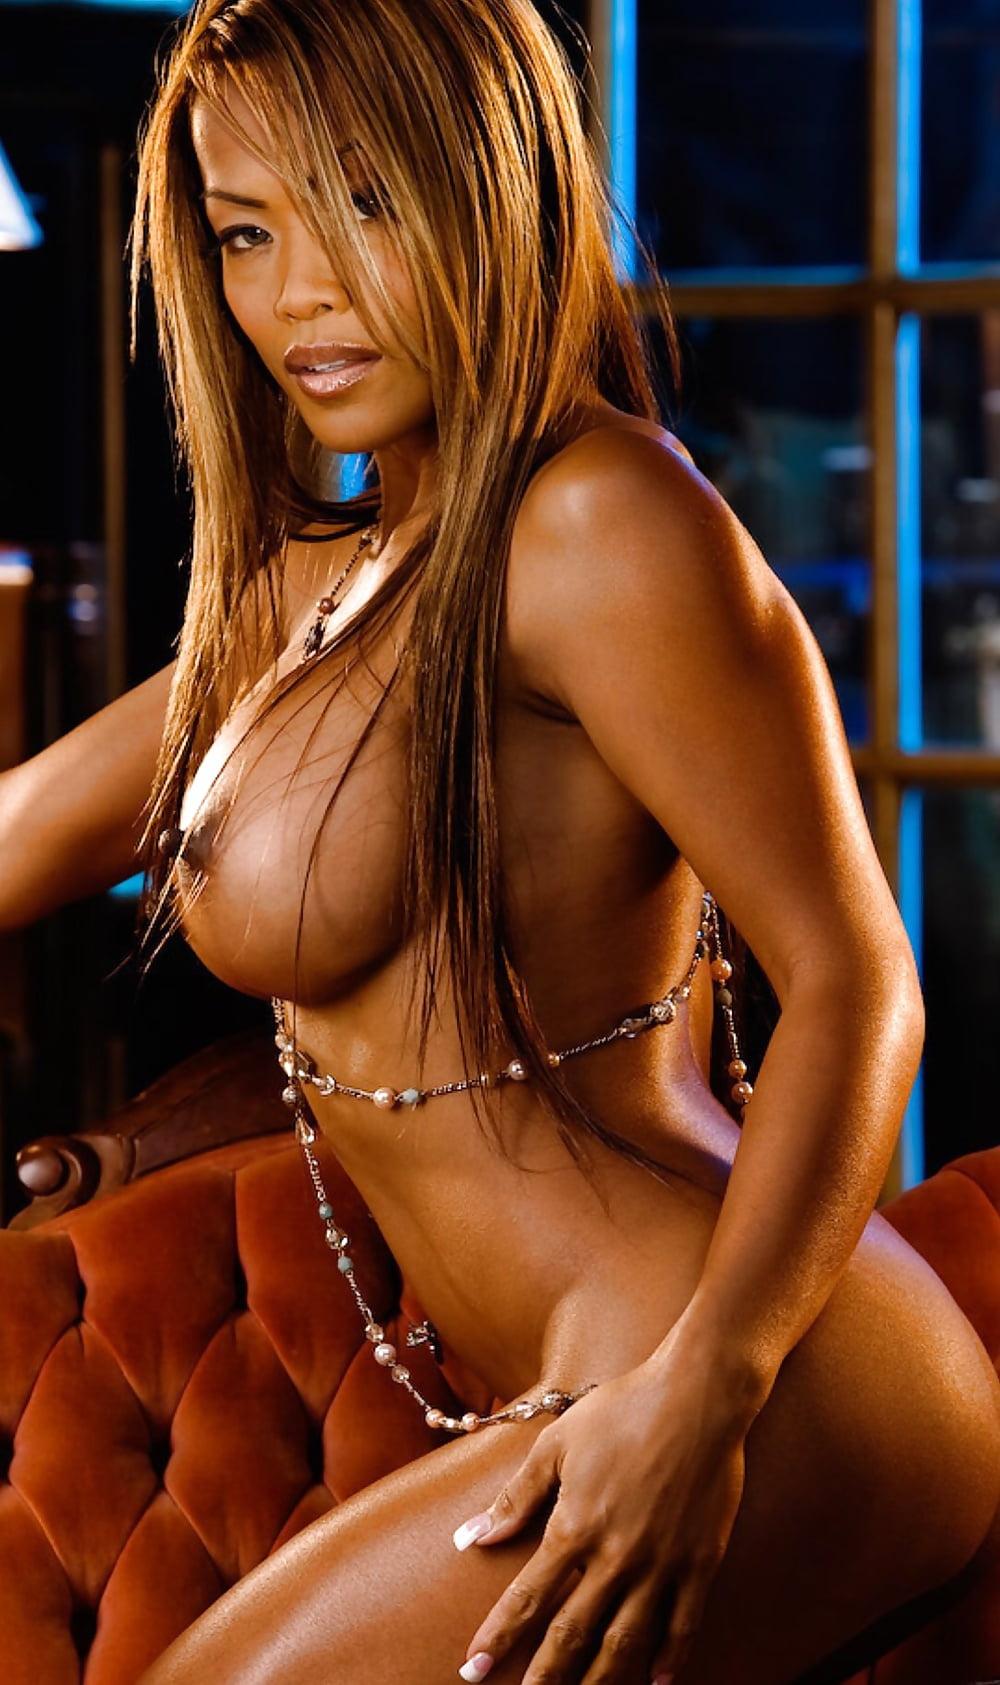 Mary alejo nude women of playboy pics